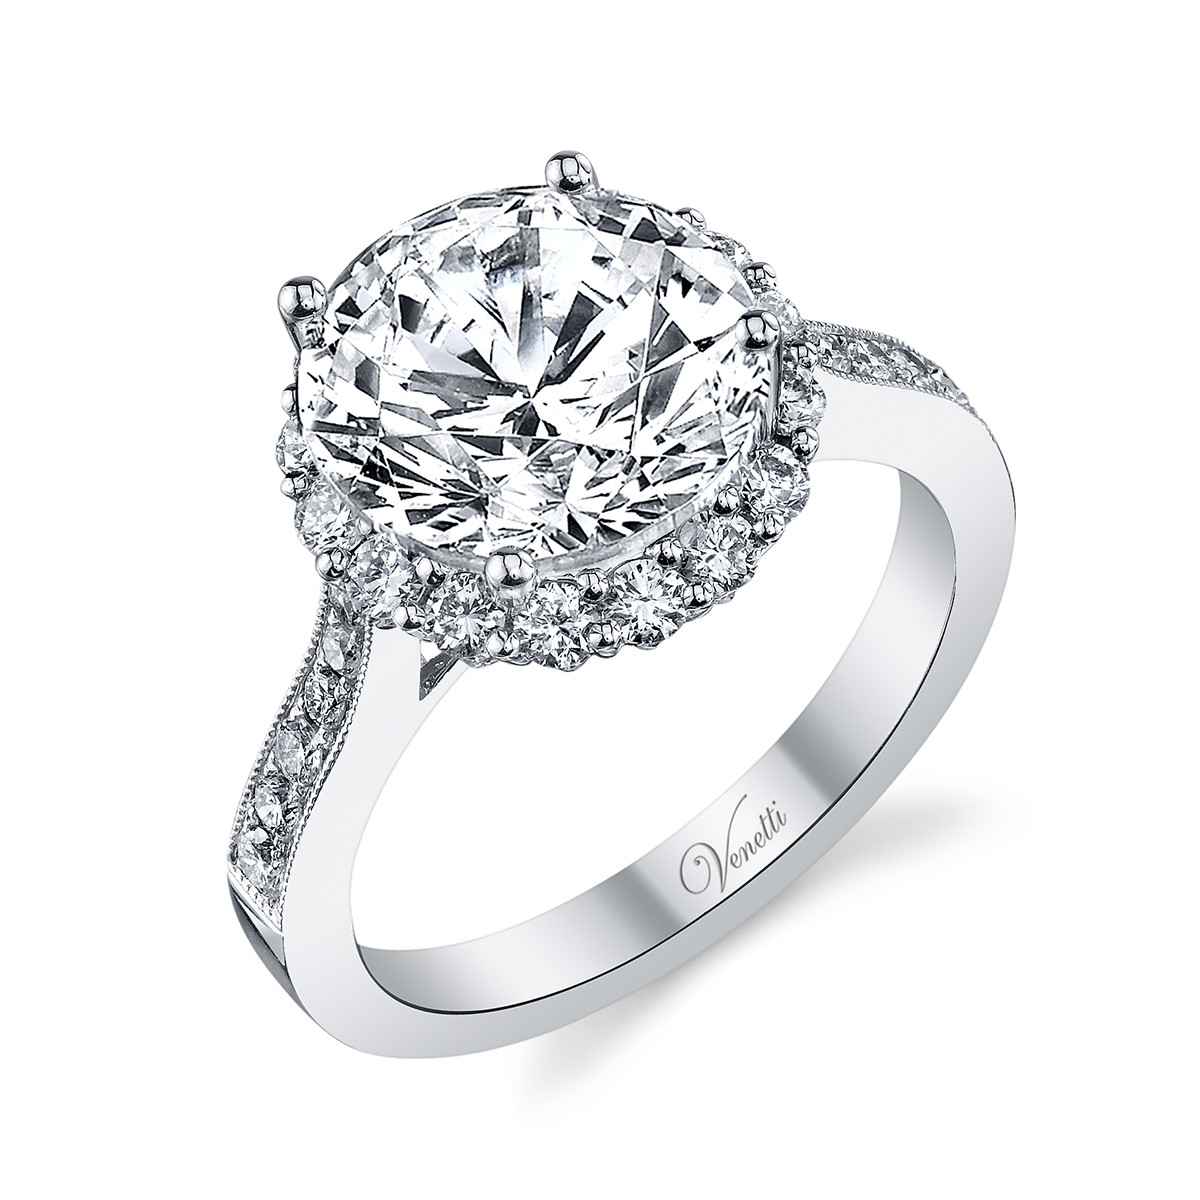 New Venetti 0.69 CTW Diamond Ring Setting